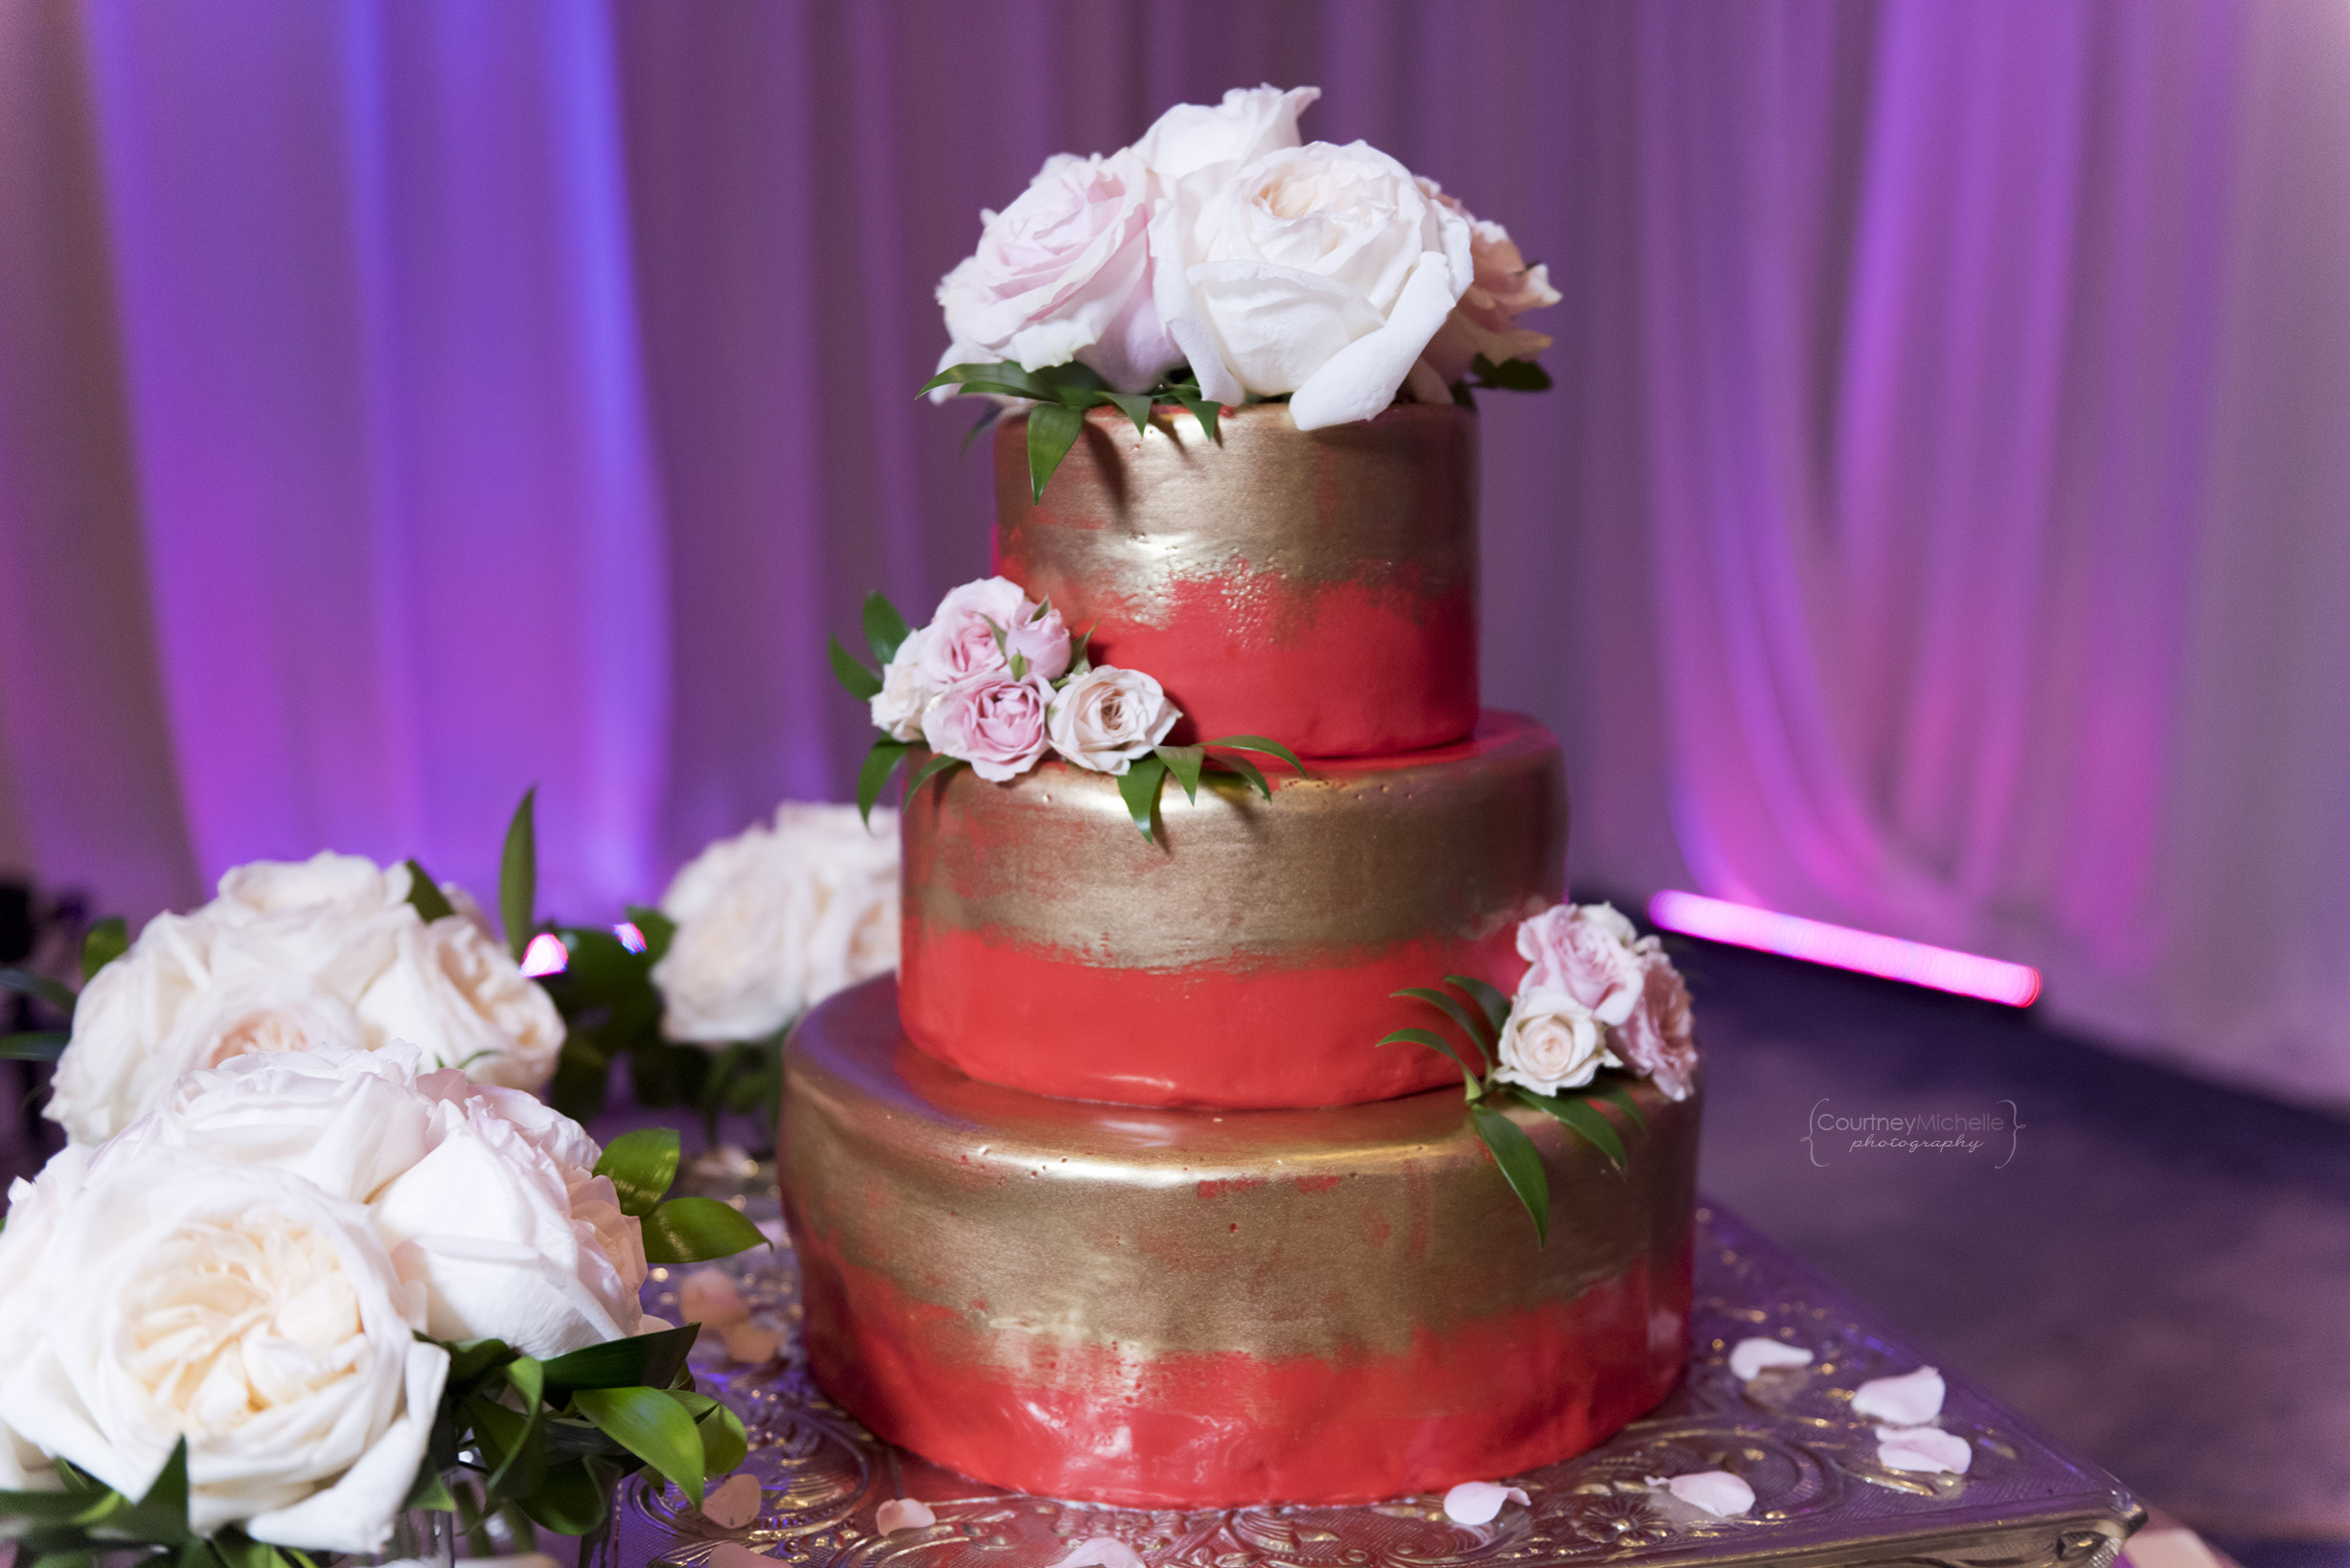 wedding-cake-grand-cayman-beach-wedding-photography-by-courtney-laper©CopyrightCMP-LeaAnneRaj-8074.jpg